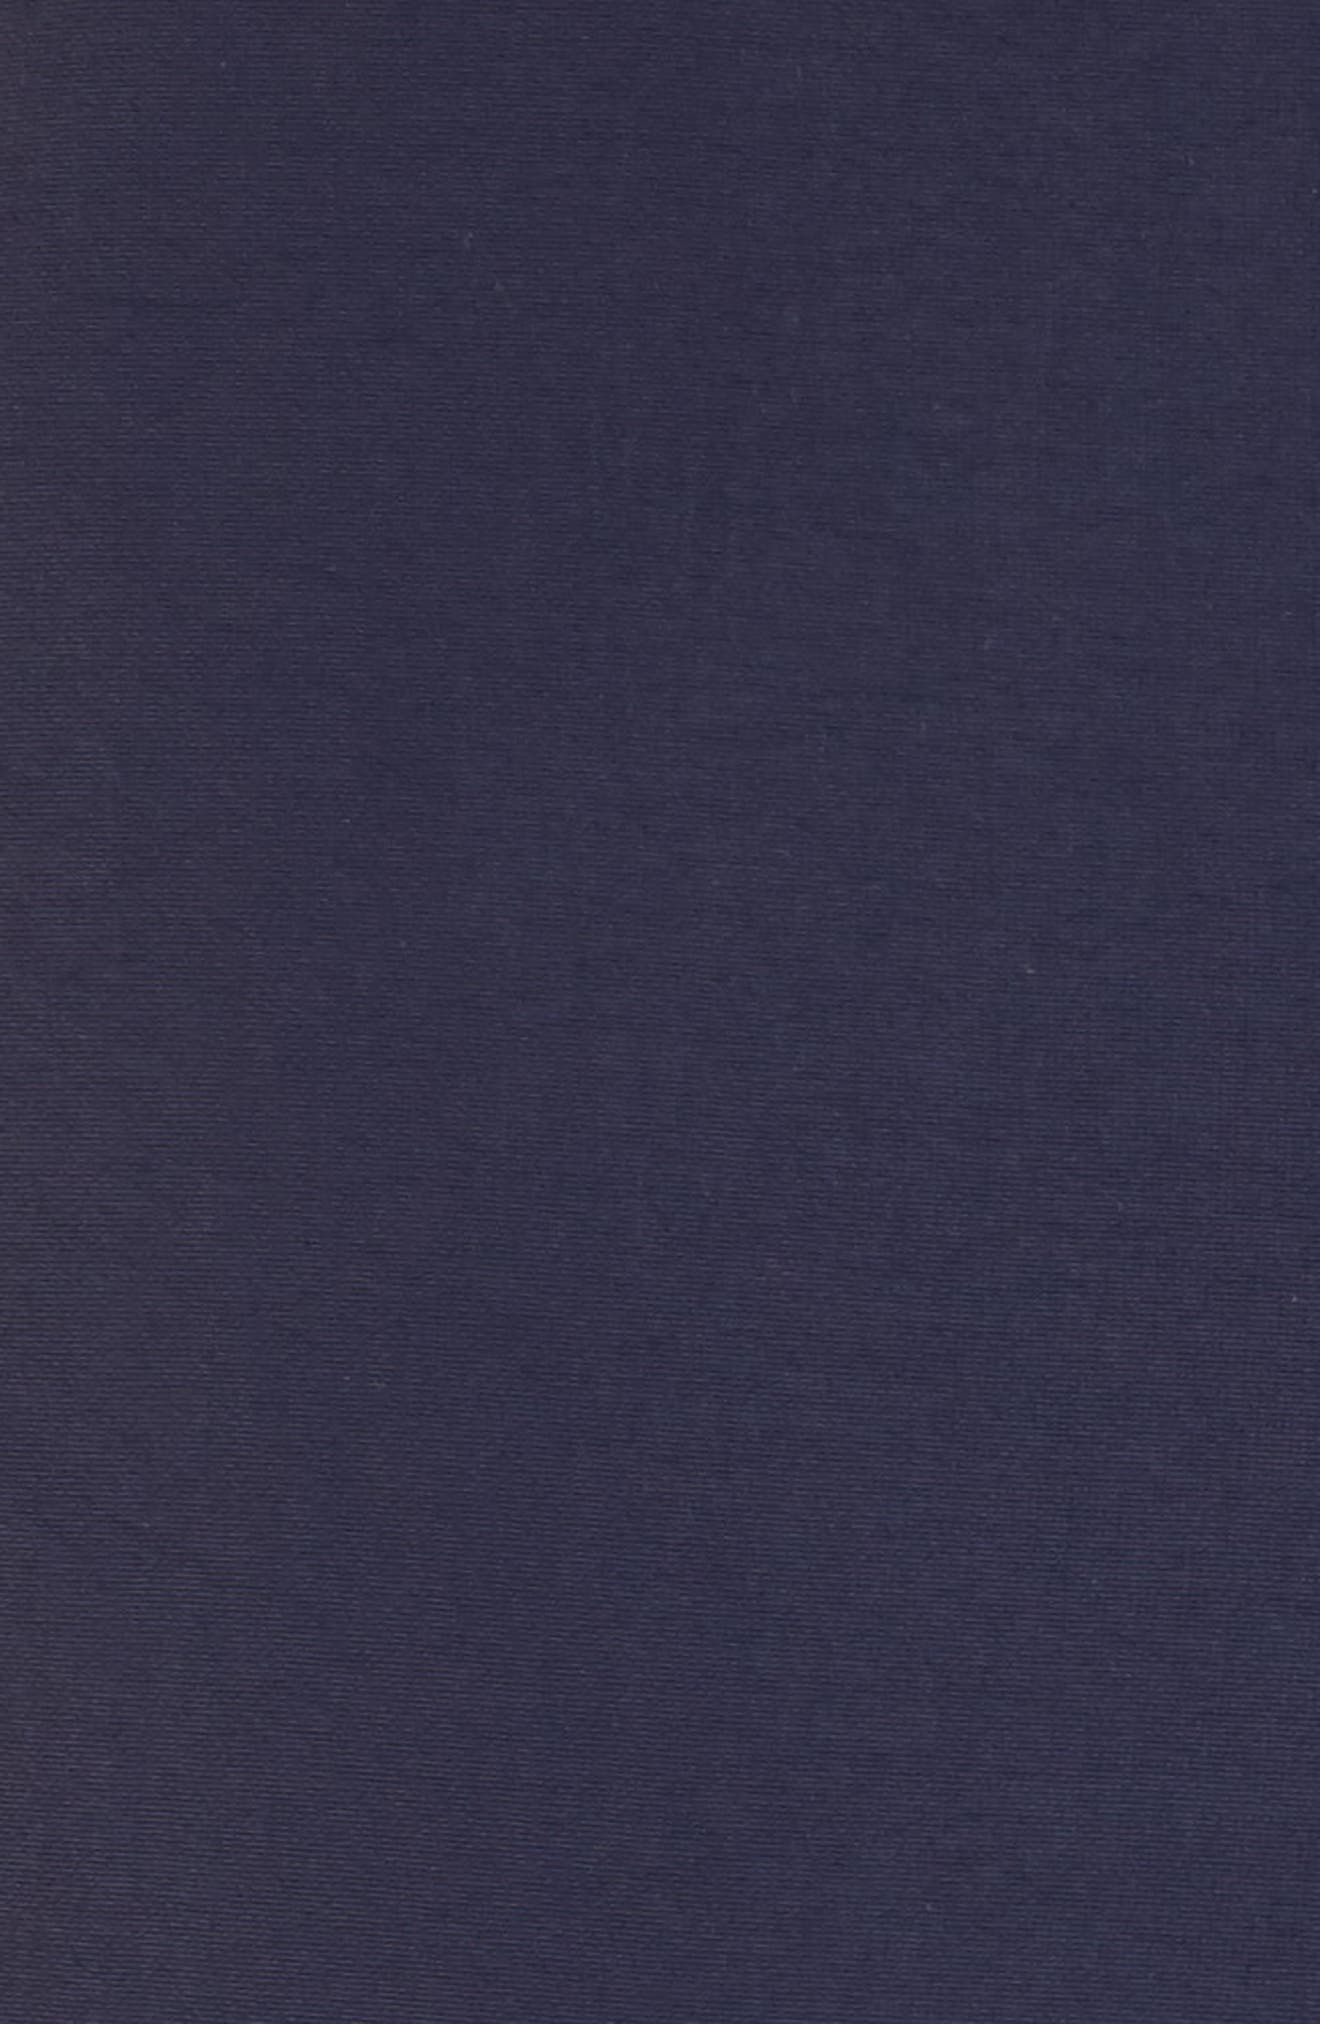 Aruba Tailored Fit French Stripe Swim Trunks,                             Alternate thumbnail 10, color,